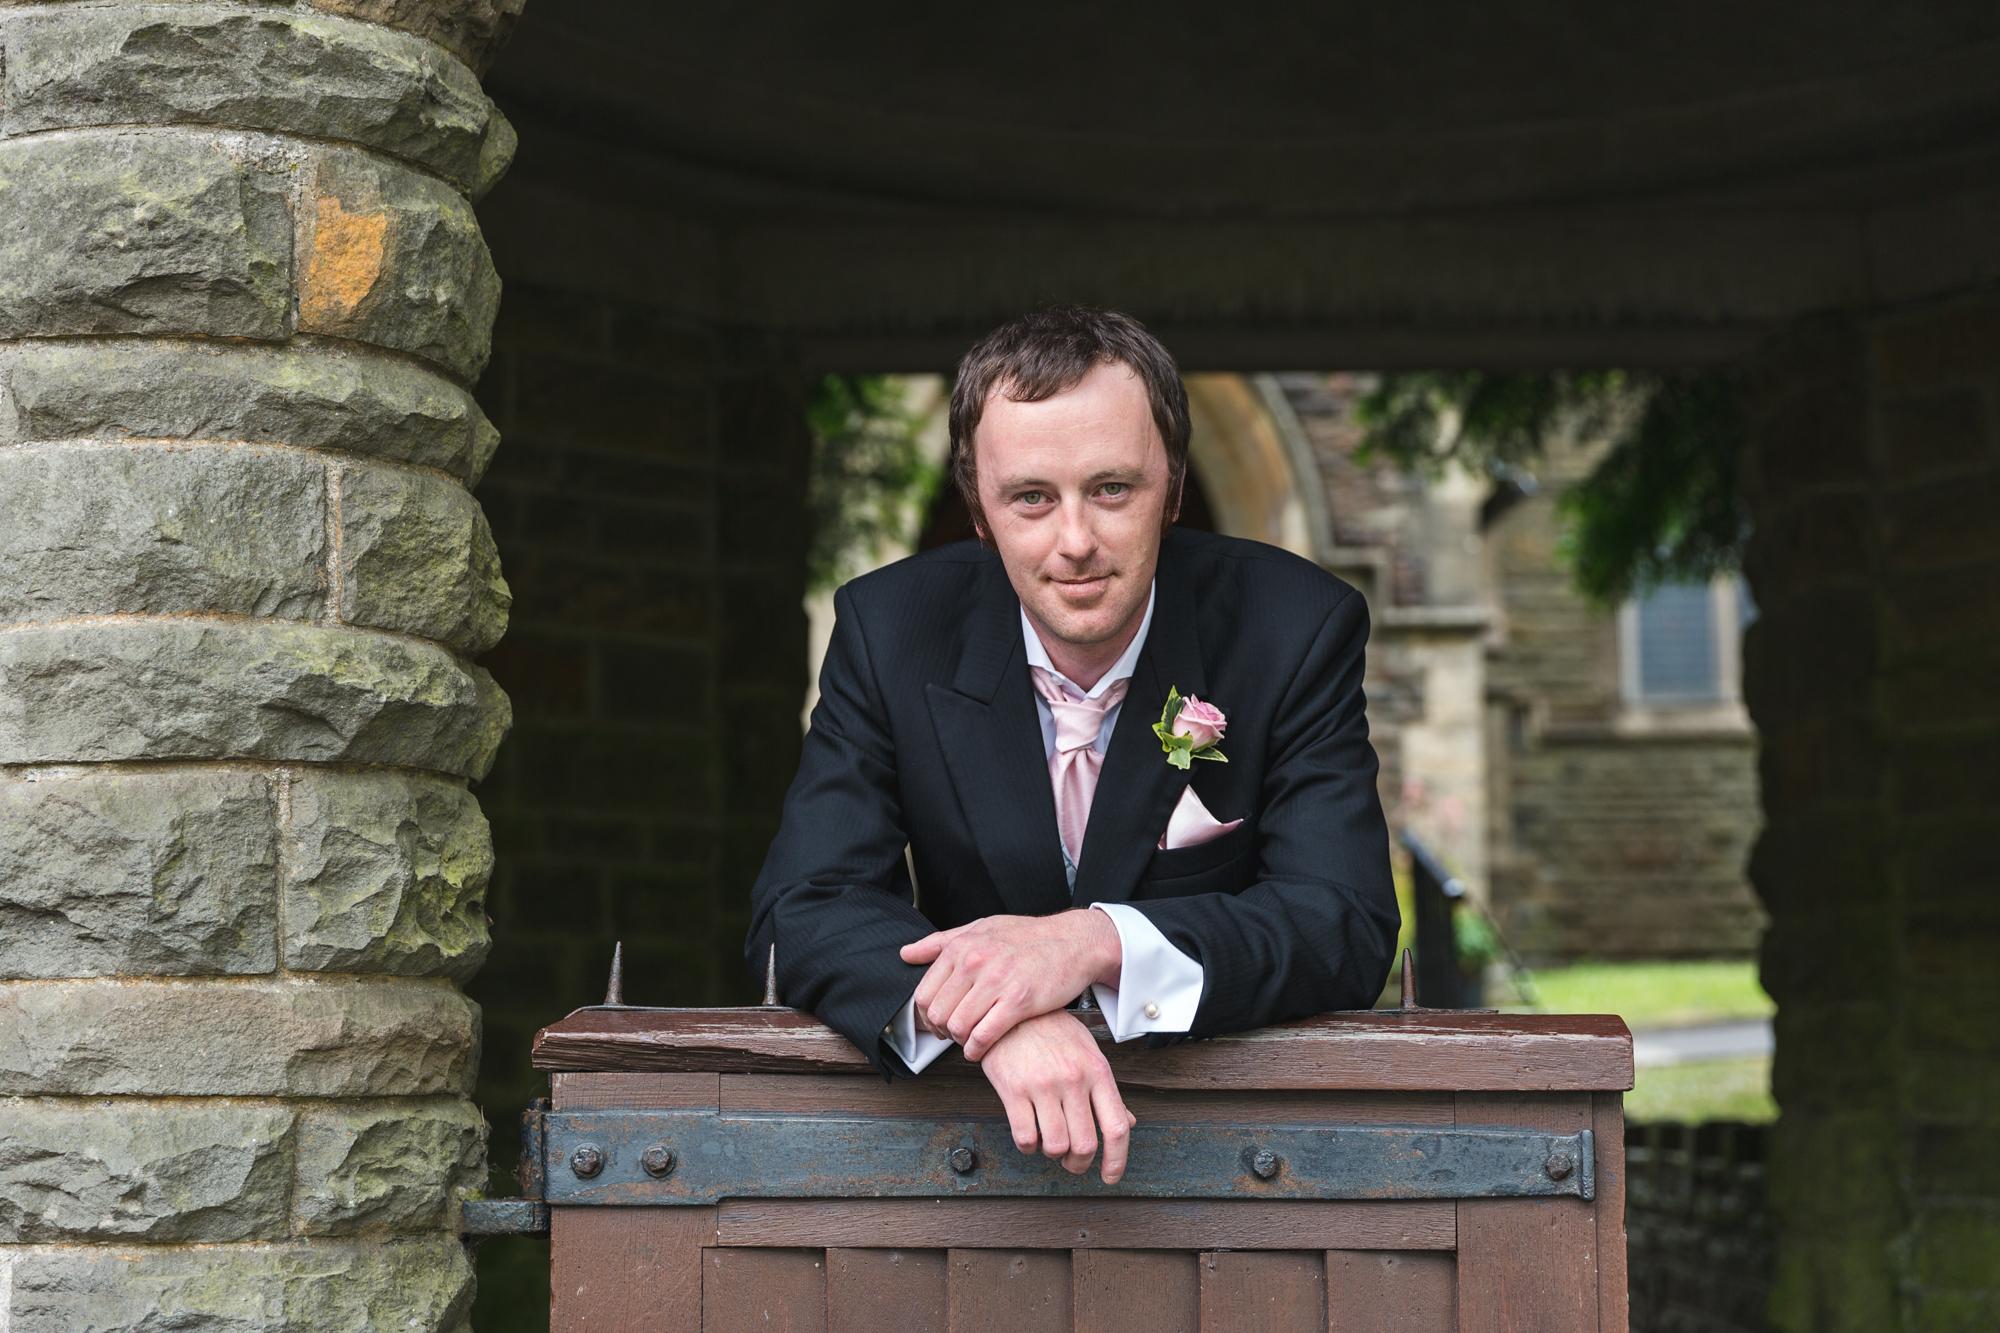 Groom at st martins church, Caerphilly